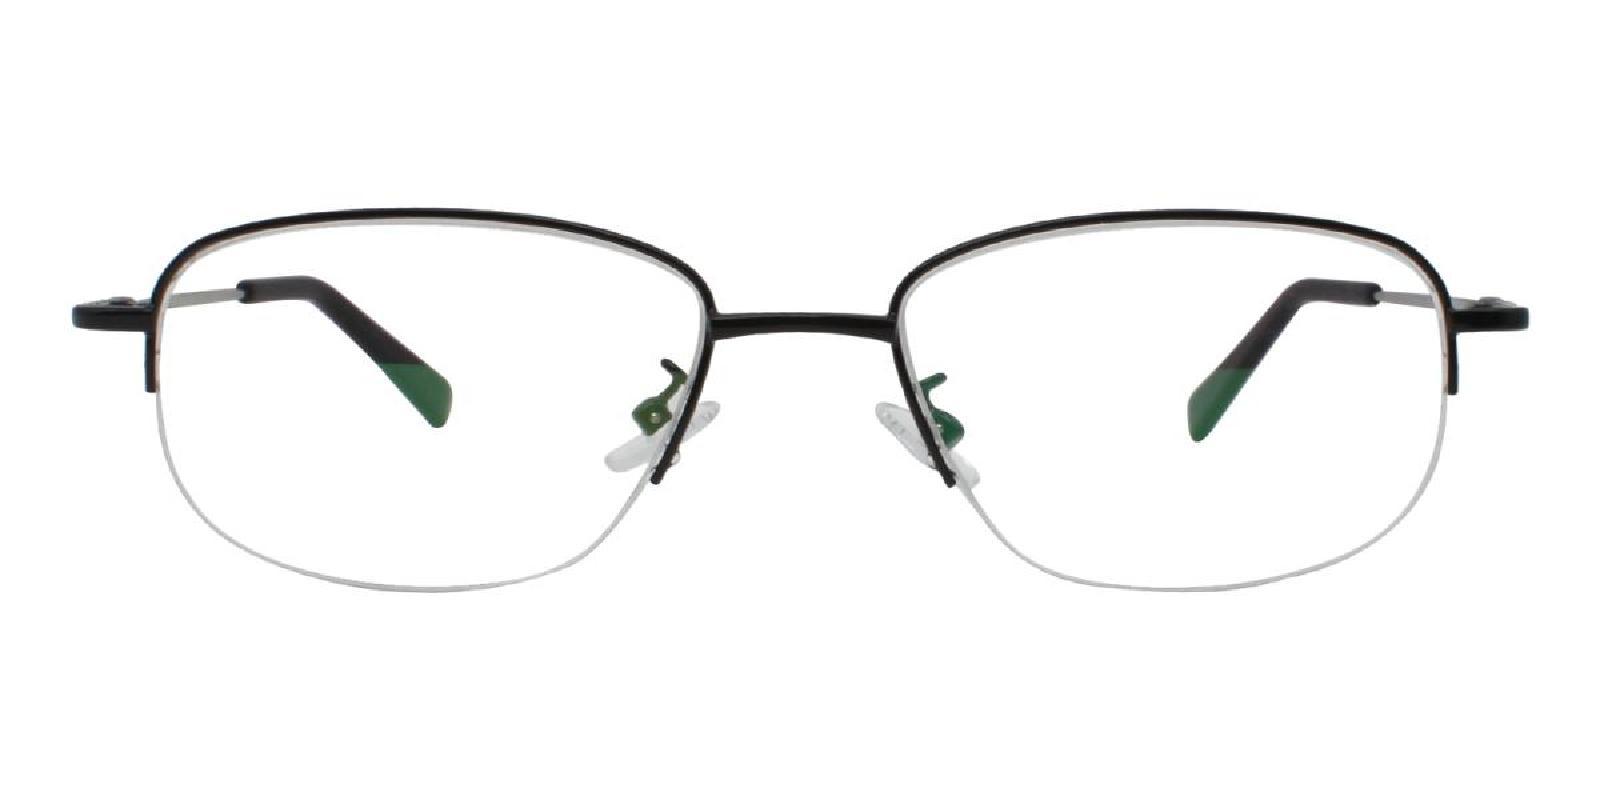 Recial-Black-Square-Metal-Eyeglasses-additional2